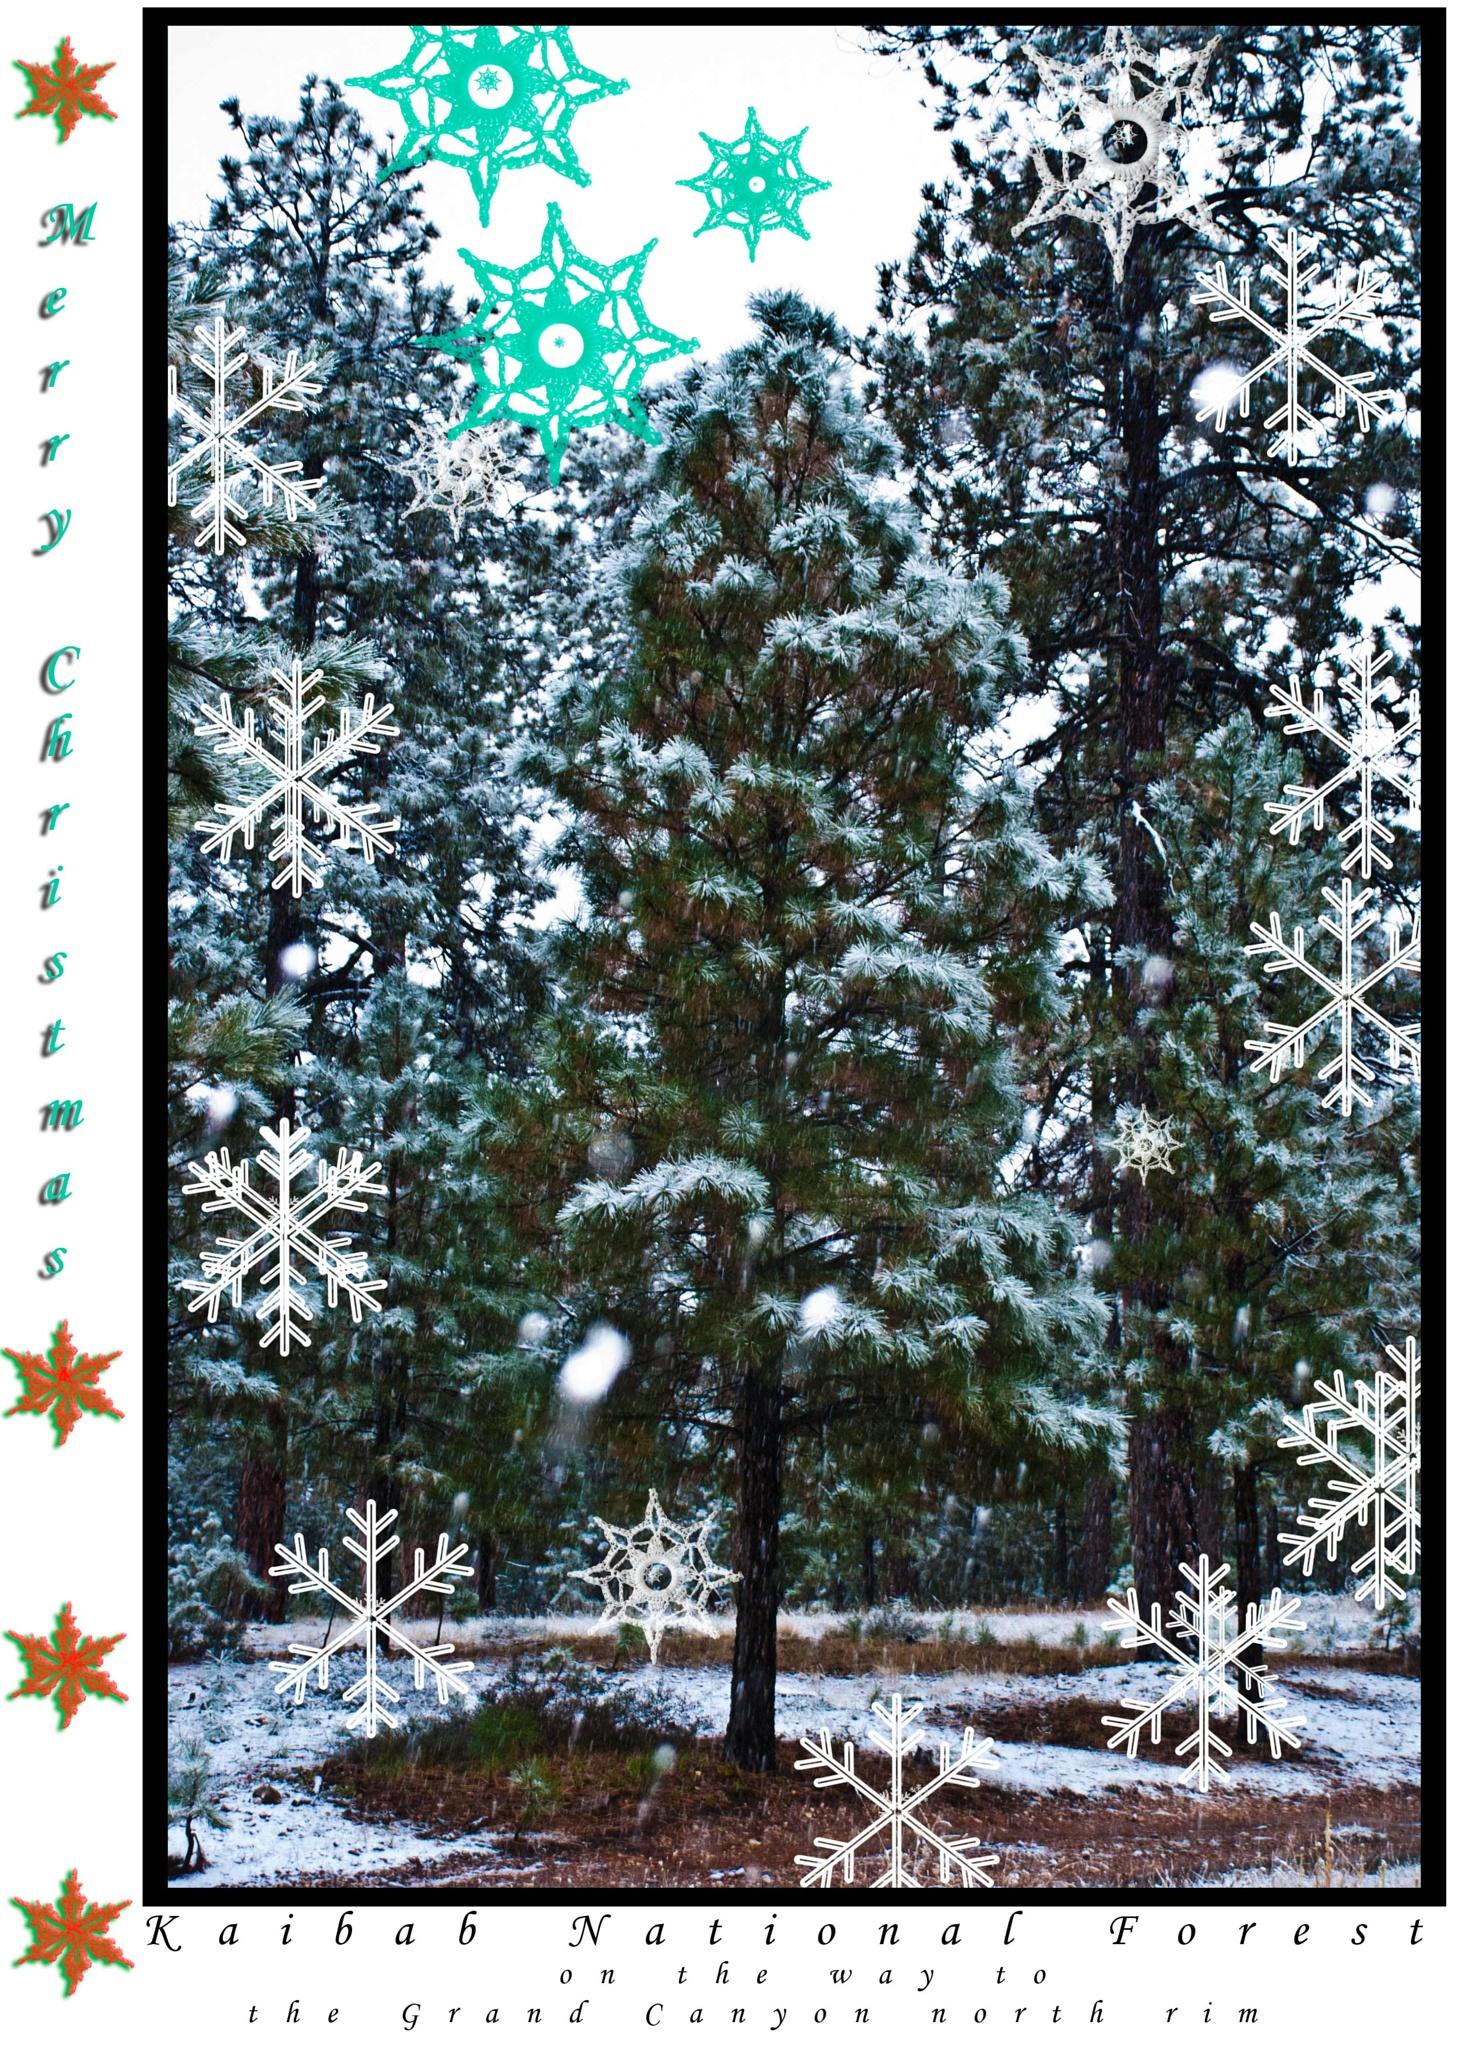 MERRY CHRISTMAS YOUPIC by RonDuBois